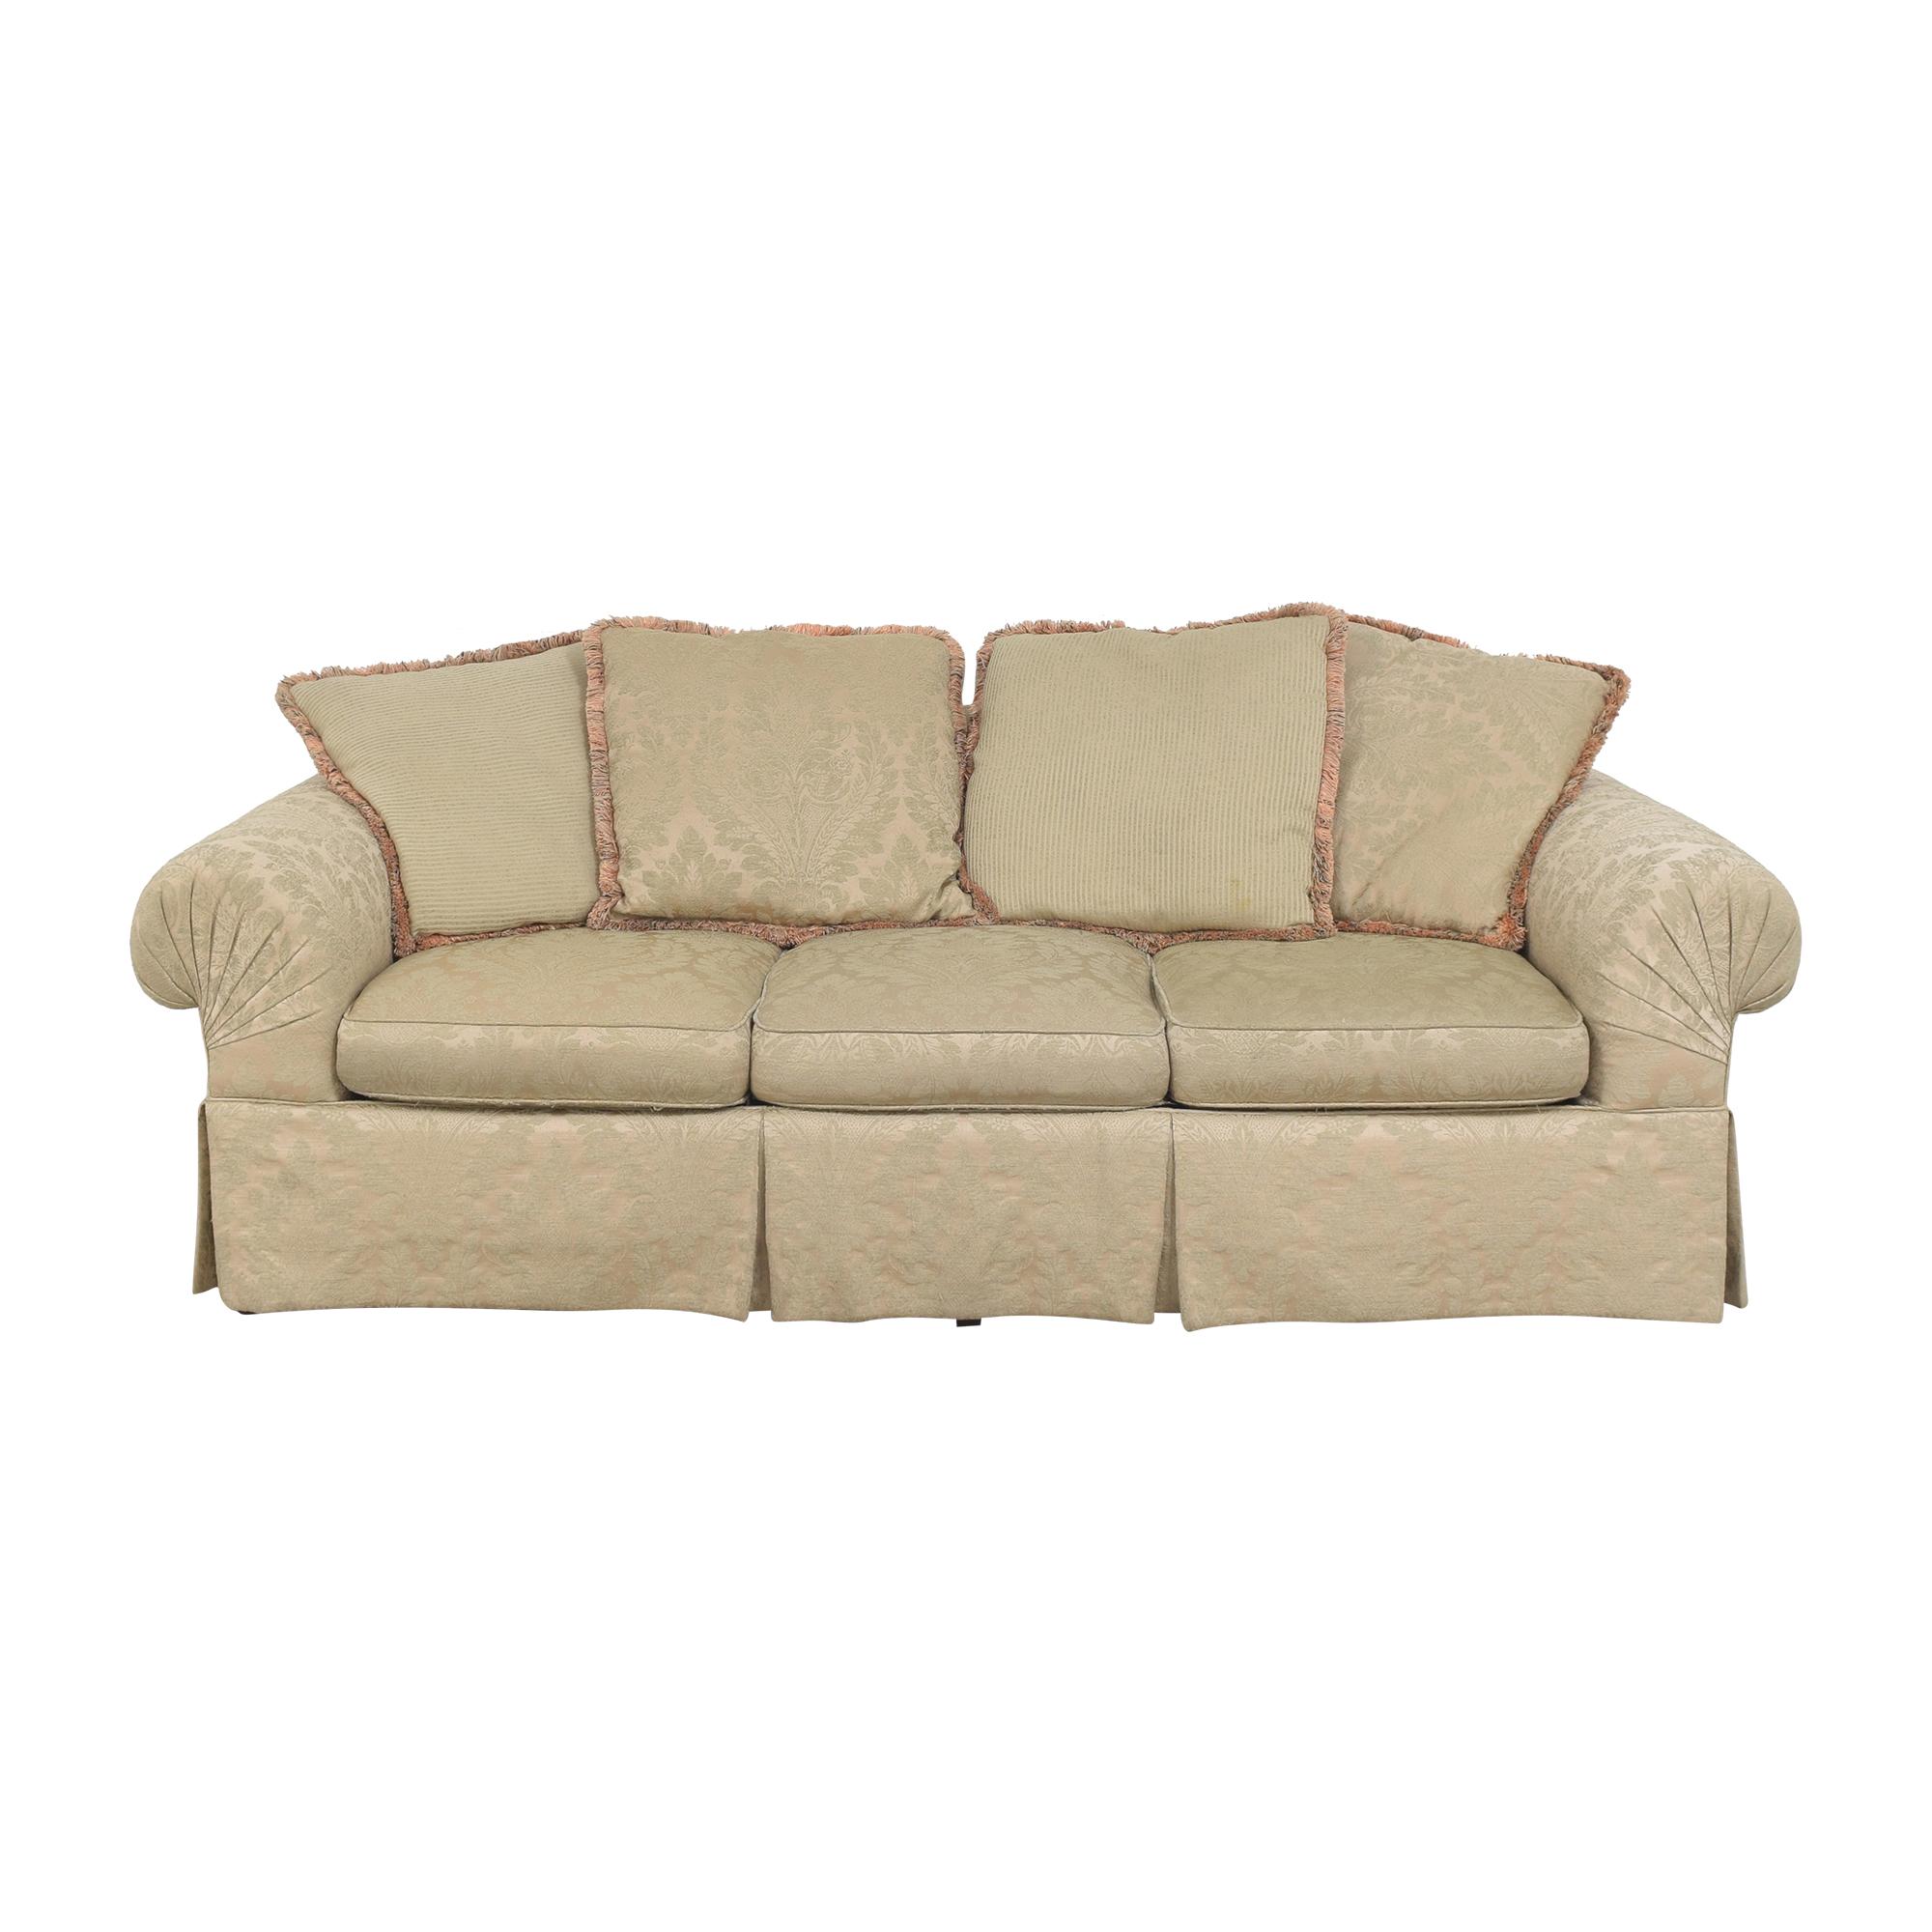 Lexington Furniture Lexington Furniture Skirted Roll Arm Sofa beige